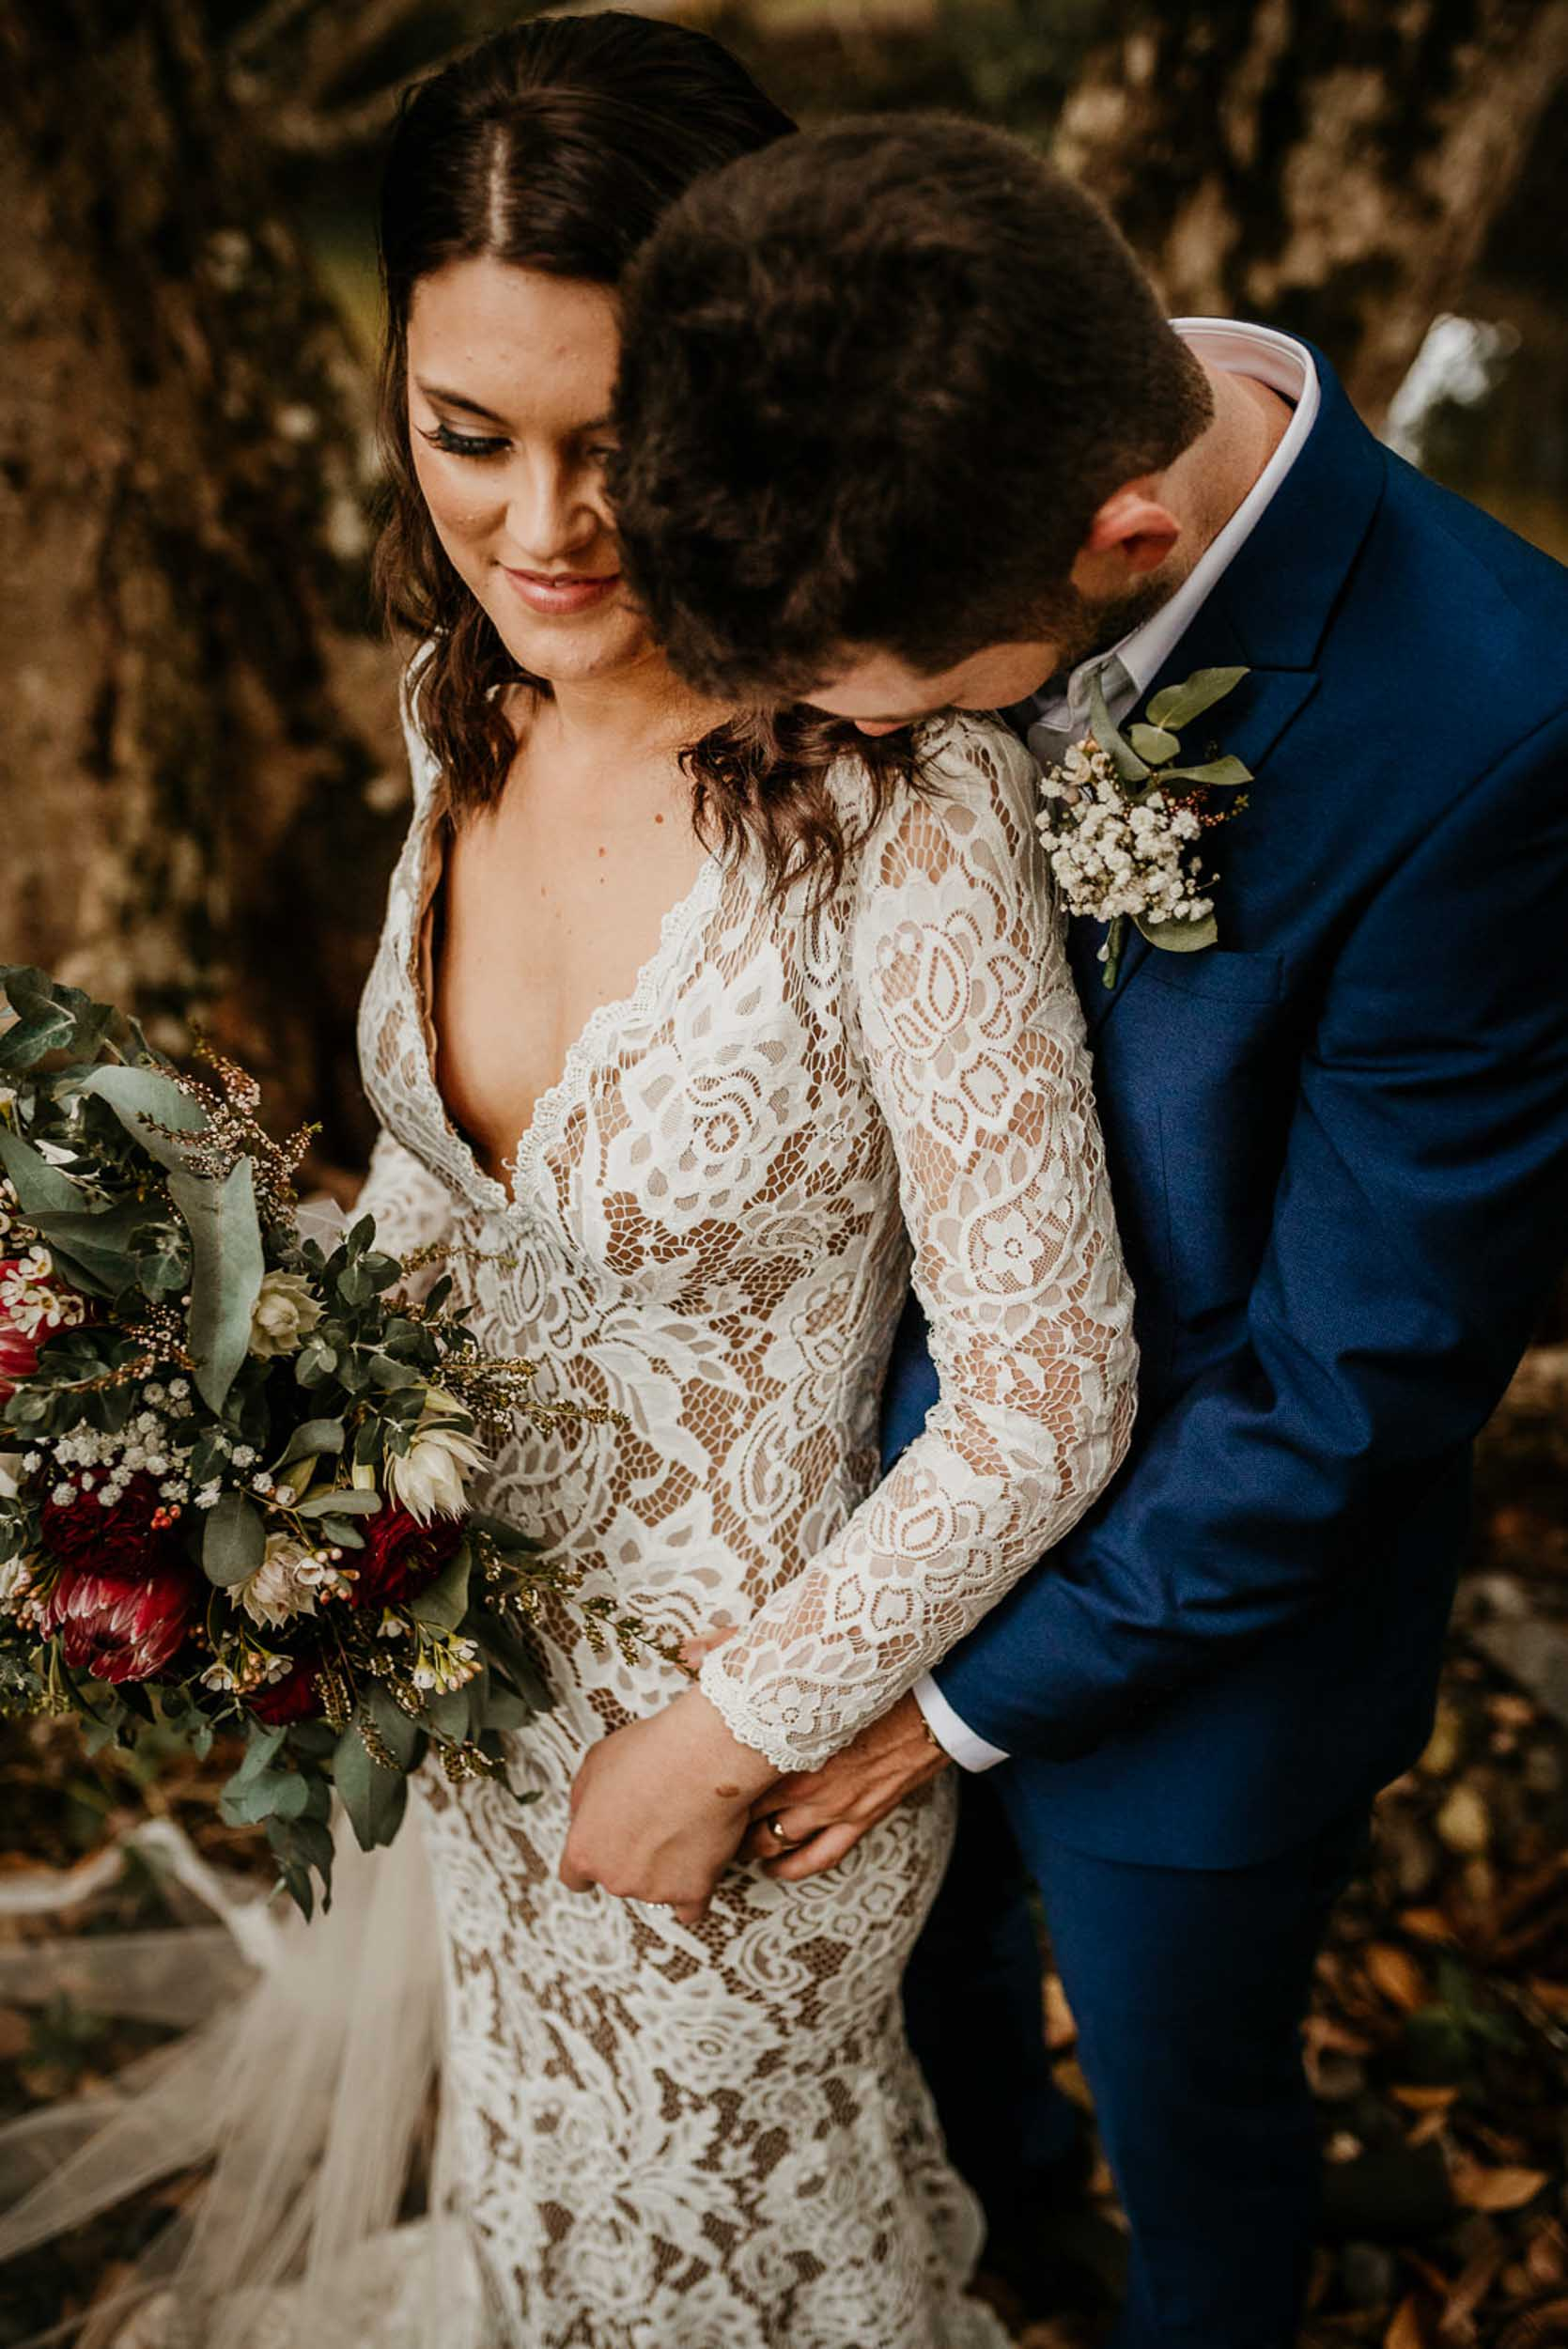 The Raw Photographer - Cairns Wedding Photographer - Laloli - Cairns Garden Wedding - Irene Costa's Devine Bridal-33.jpg